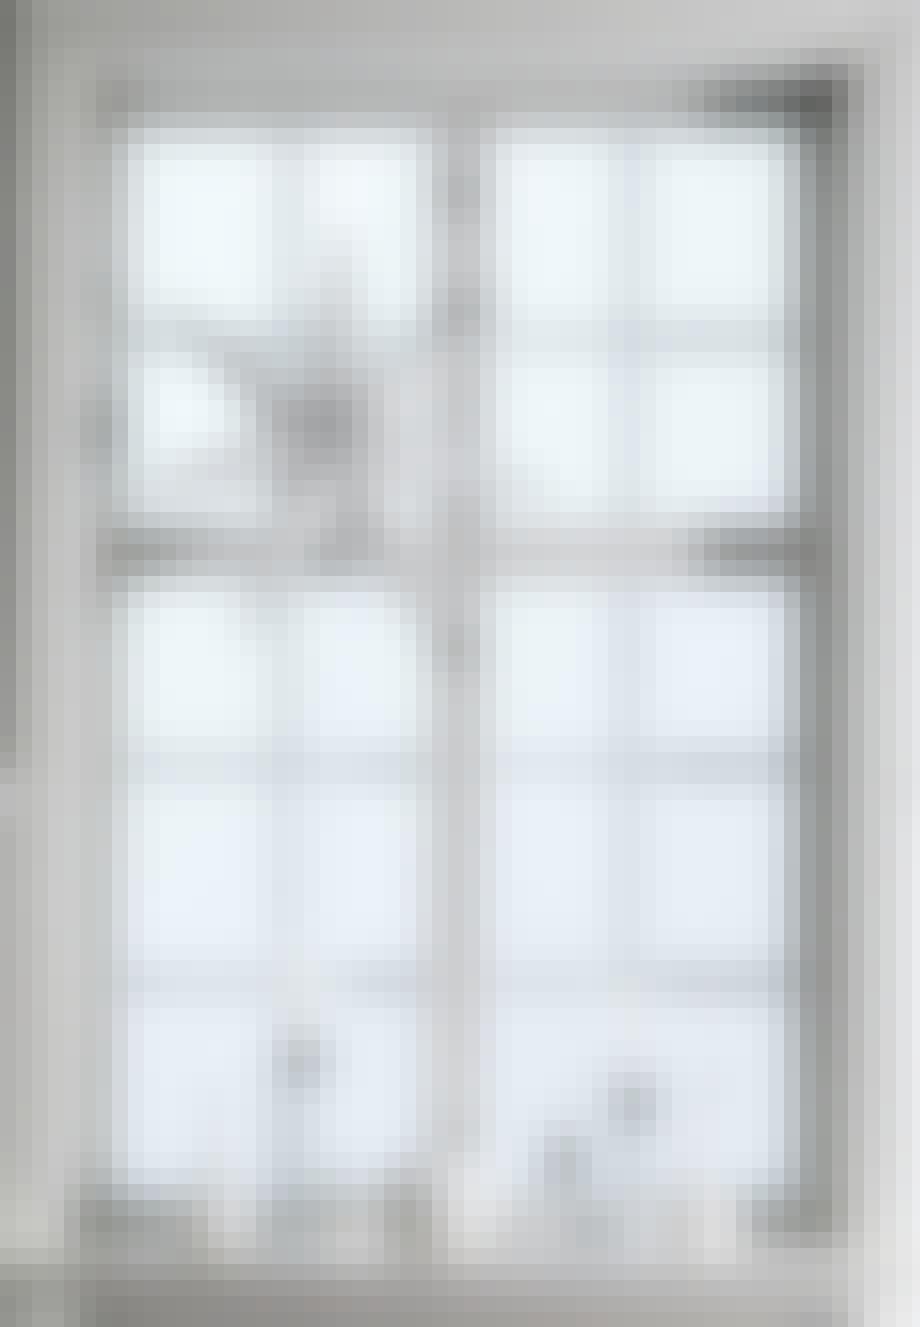 Lys i vinduet